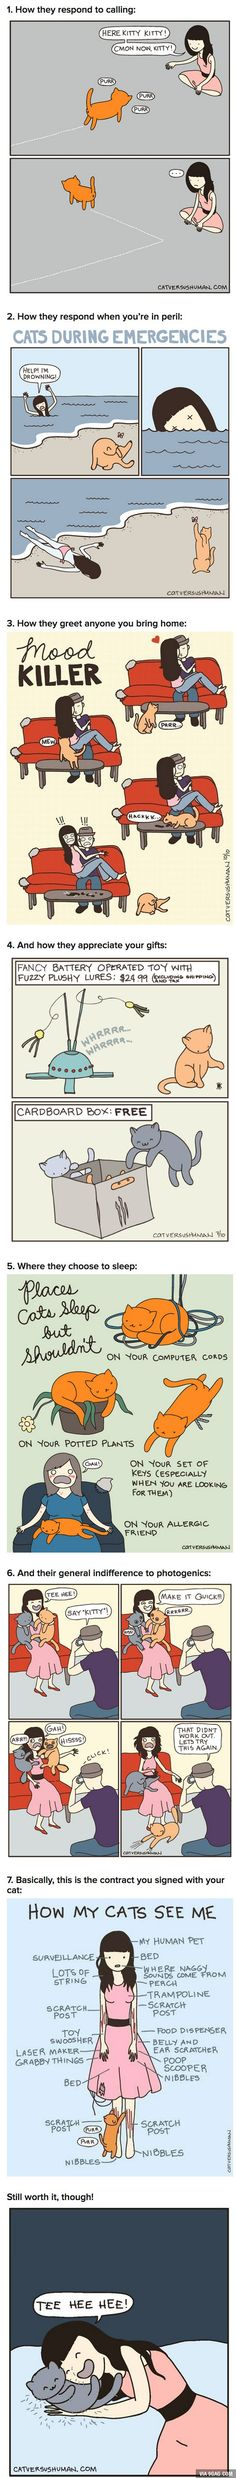 7 Least Helpful Cat Habits